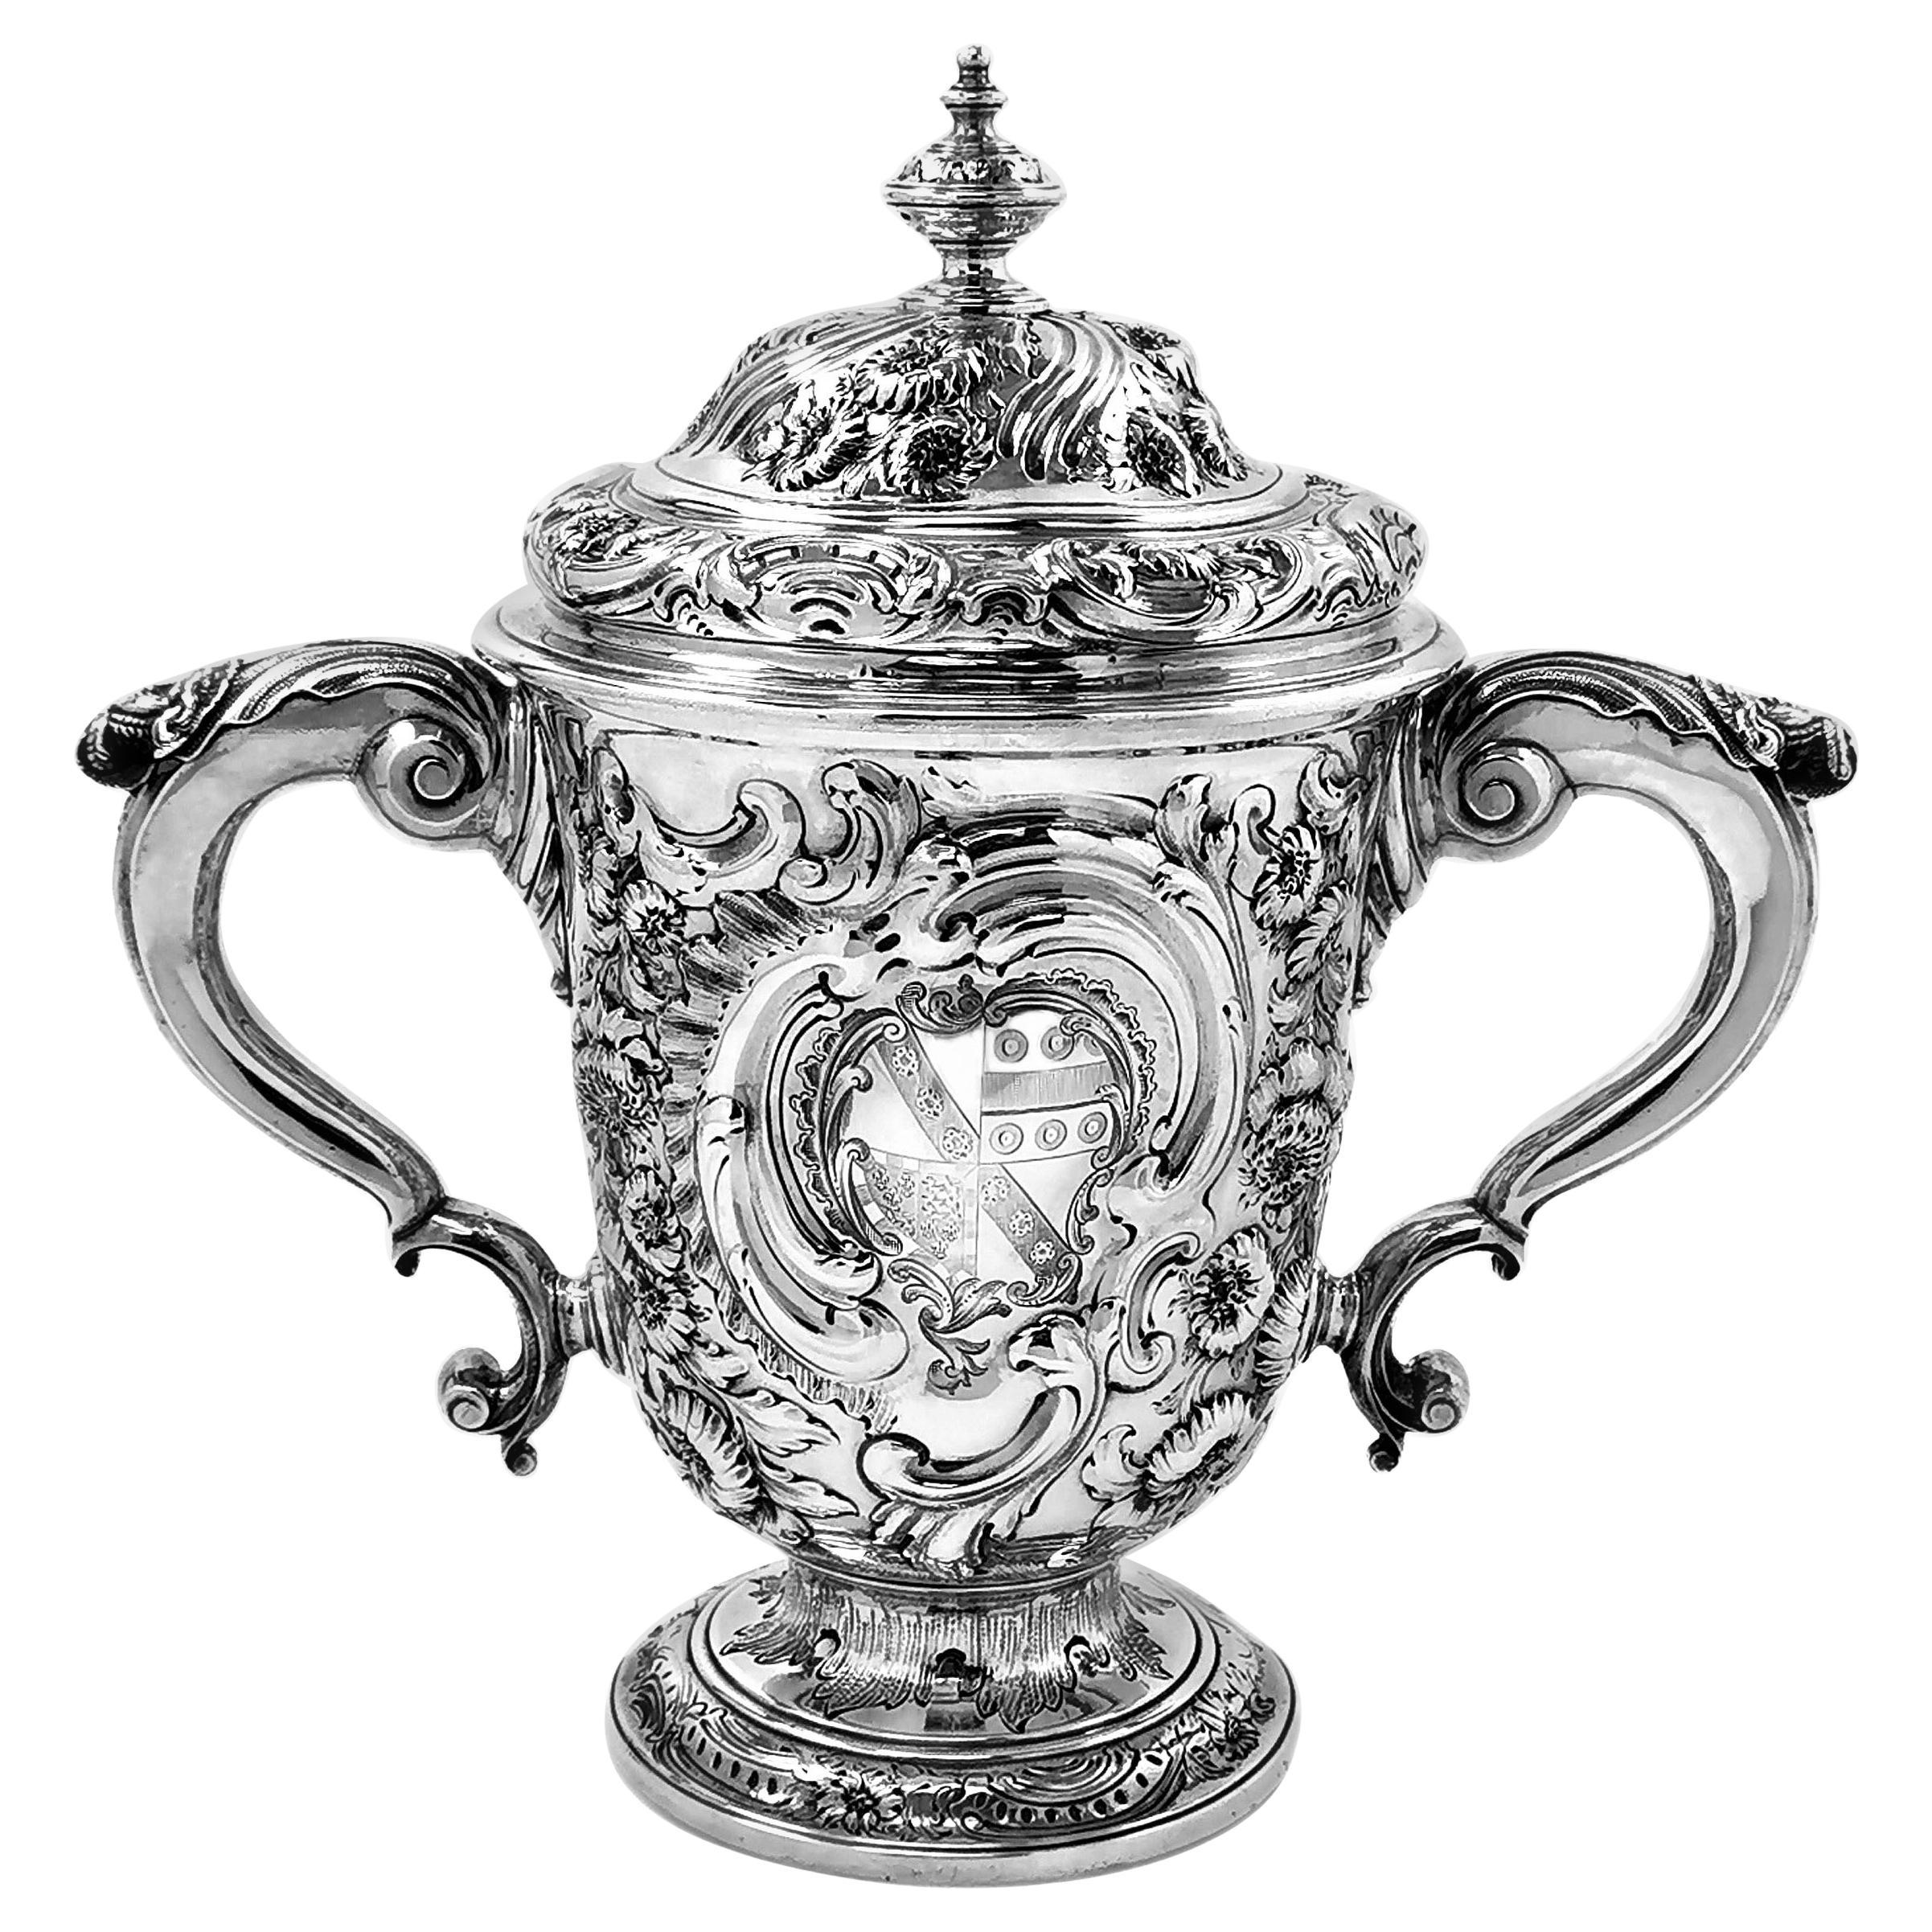 George II Vases and Vessels